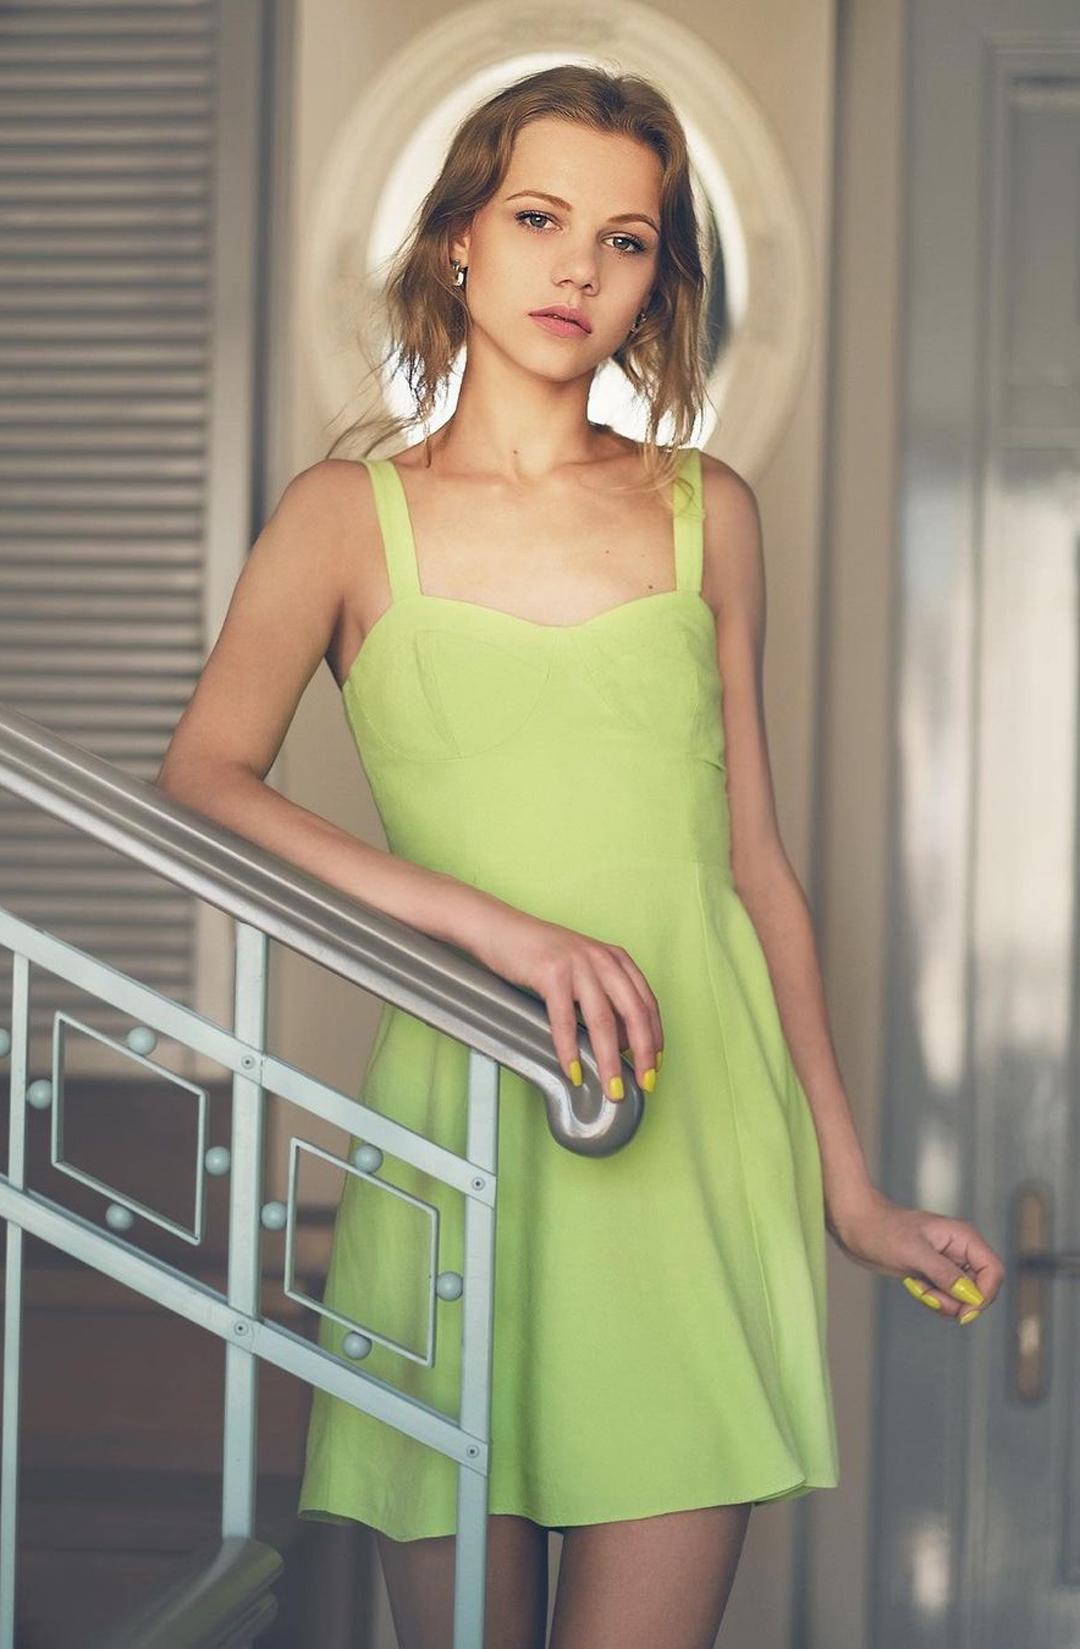 Mariana-Kmet-Wallpapers-Insta-Fit-Bio-3